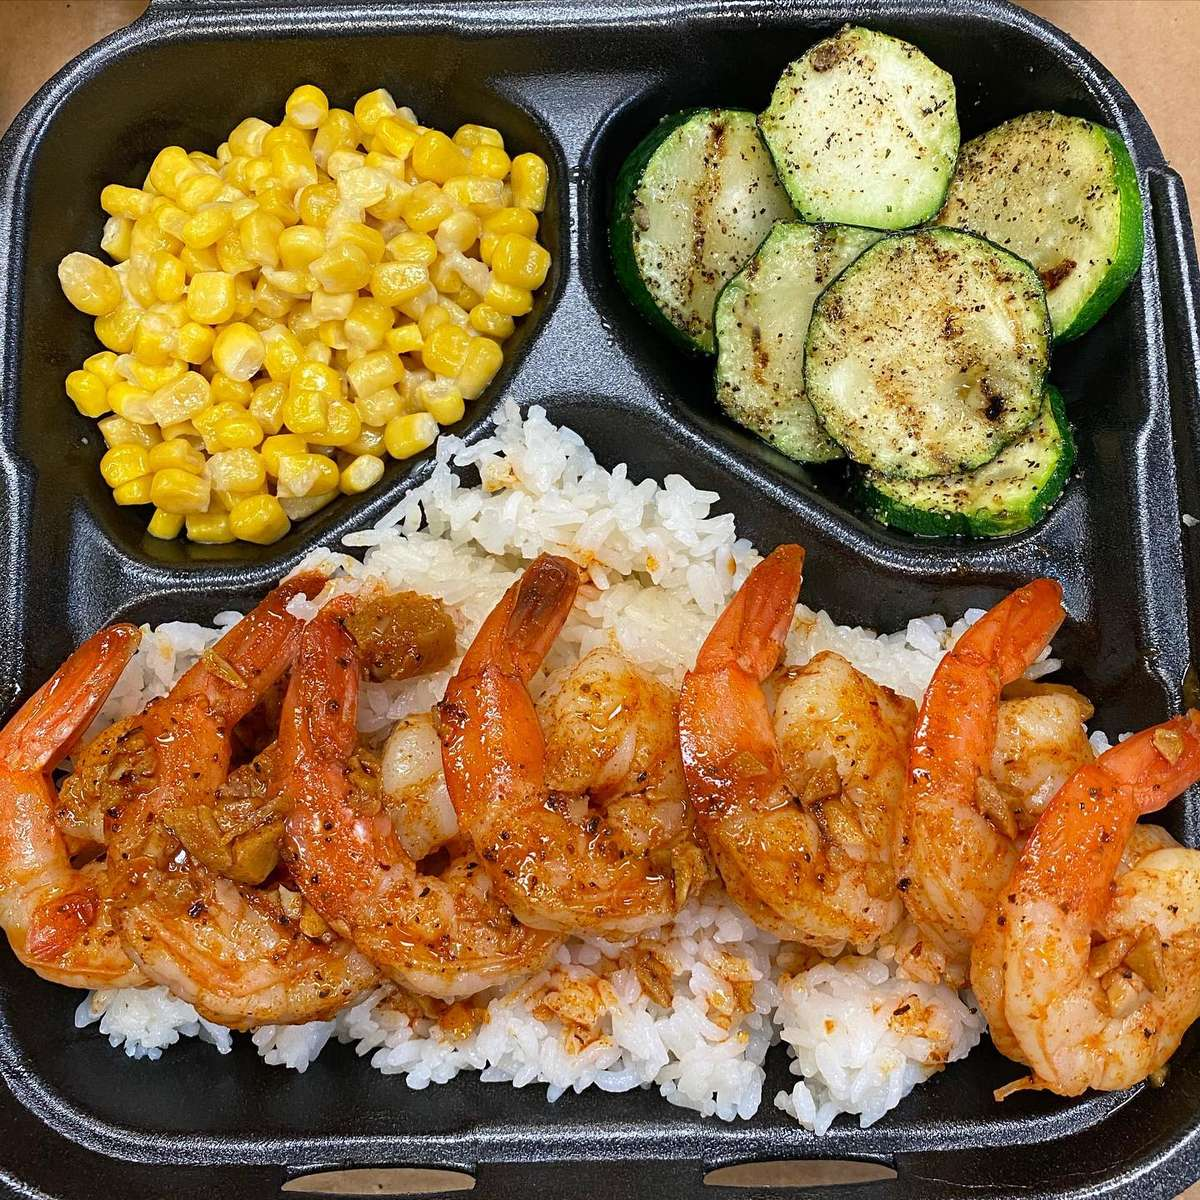 Shrimp Fire Grilled Plate